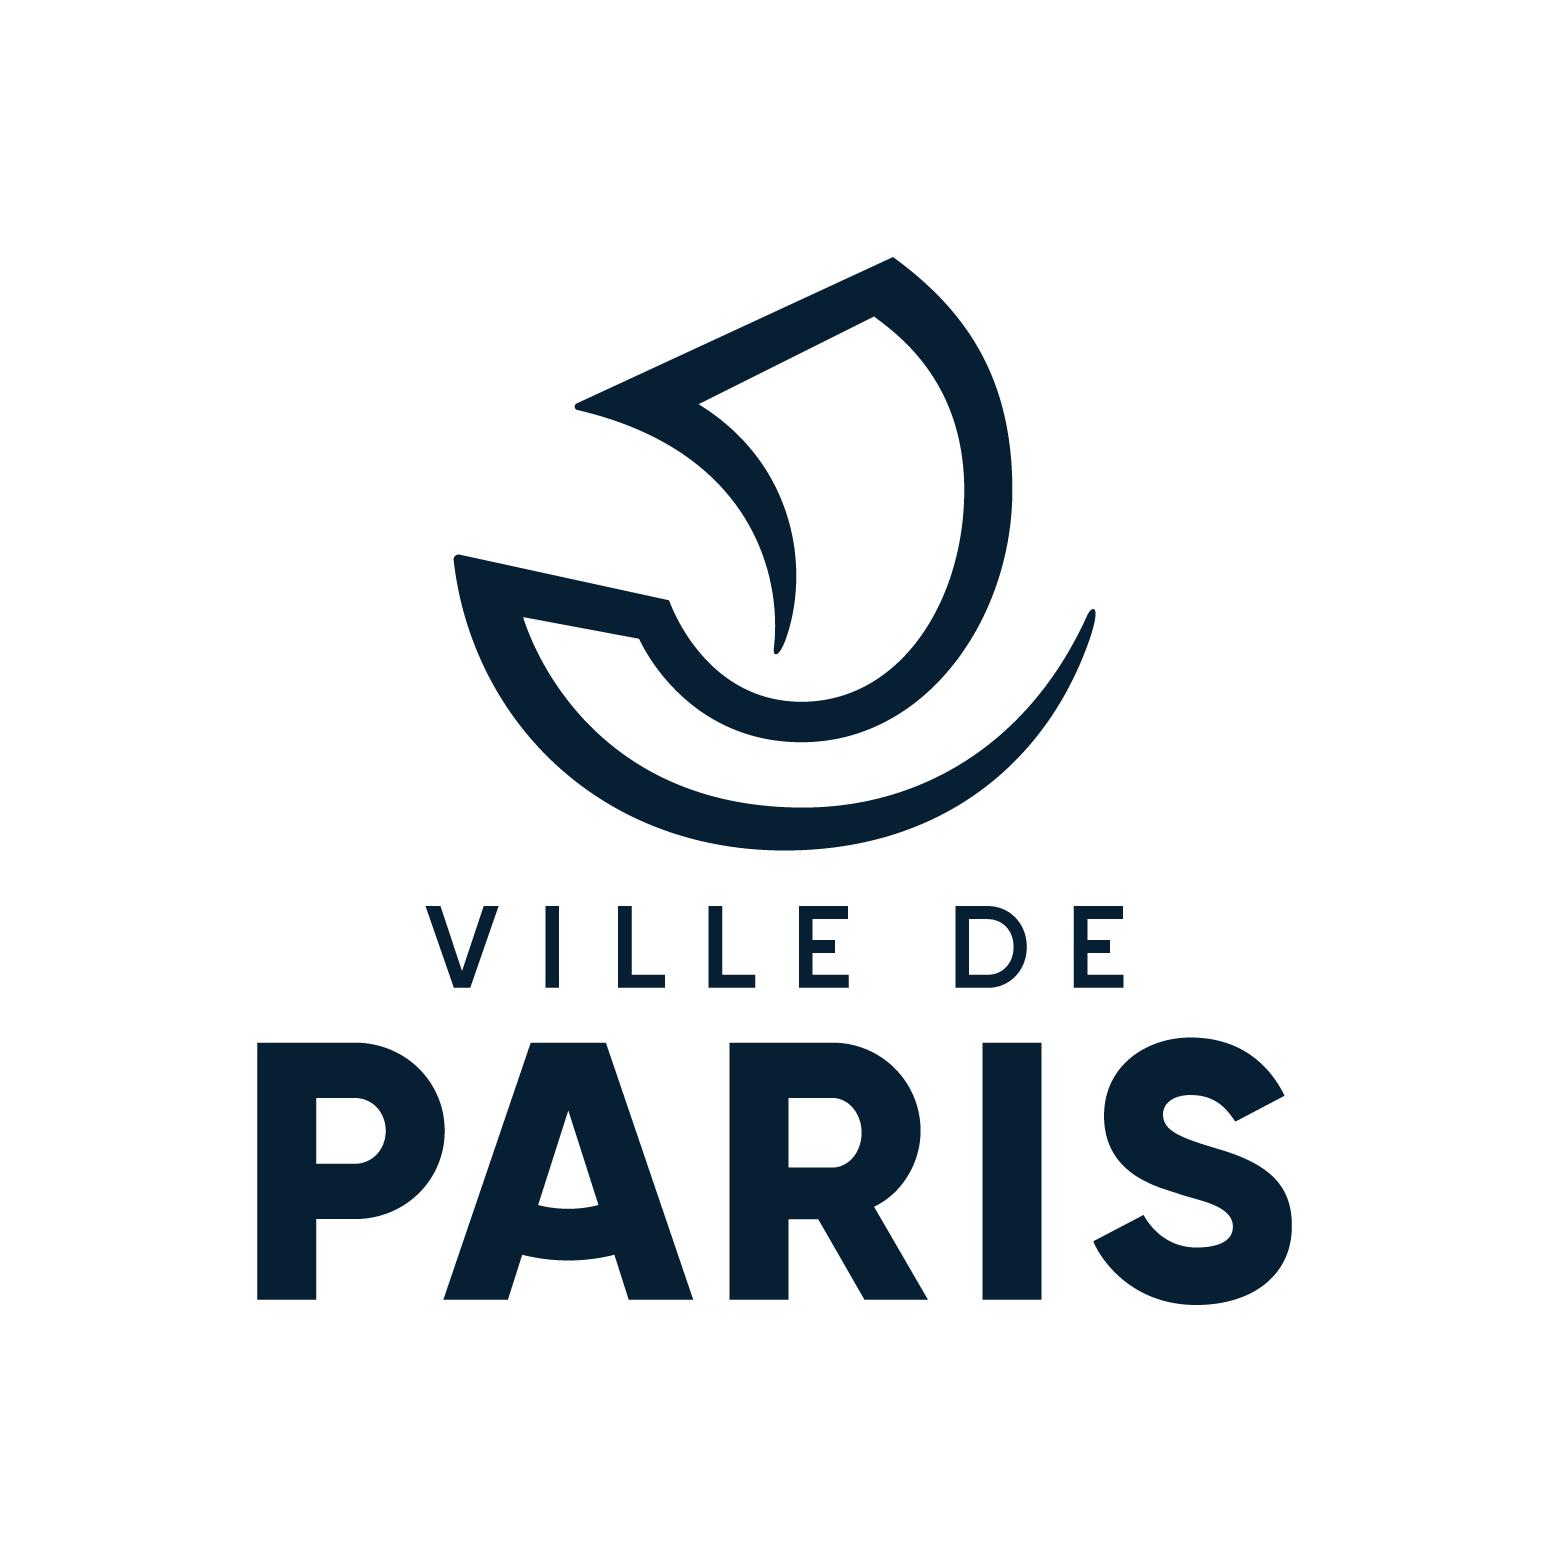 VILLE_DE_PARIS_LOGO_VERTICAL_POS_RVB